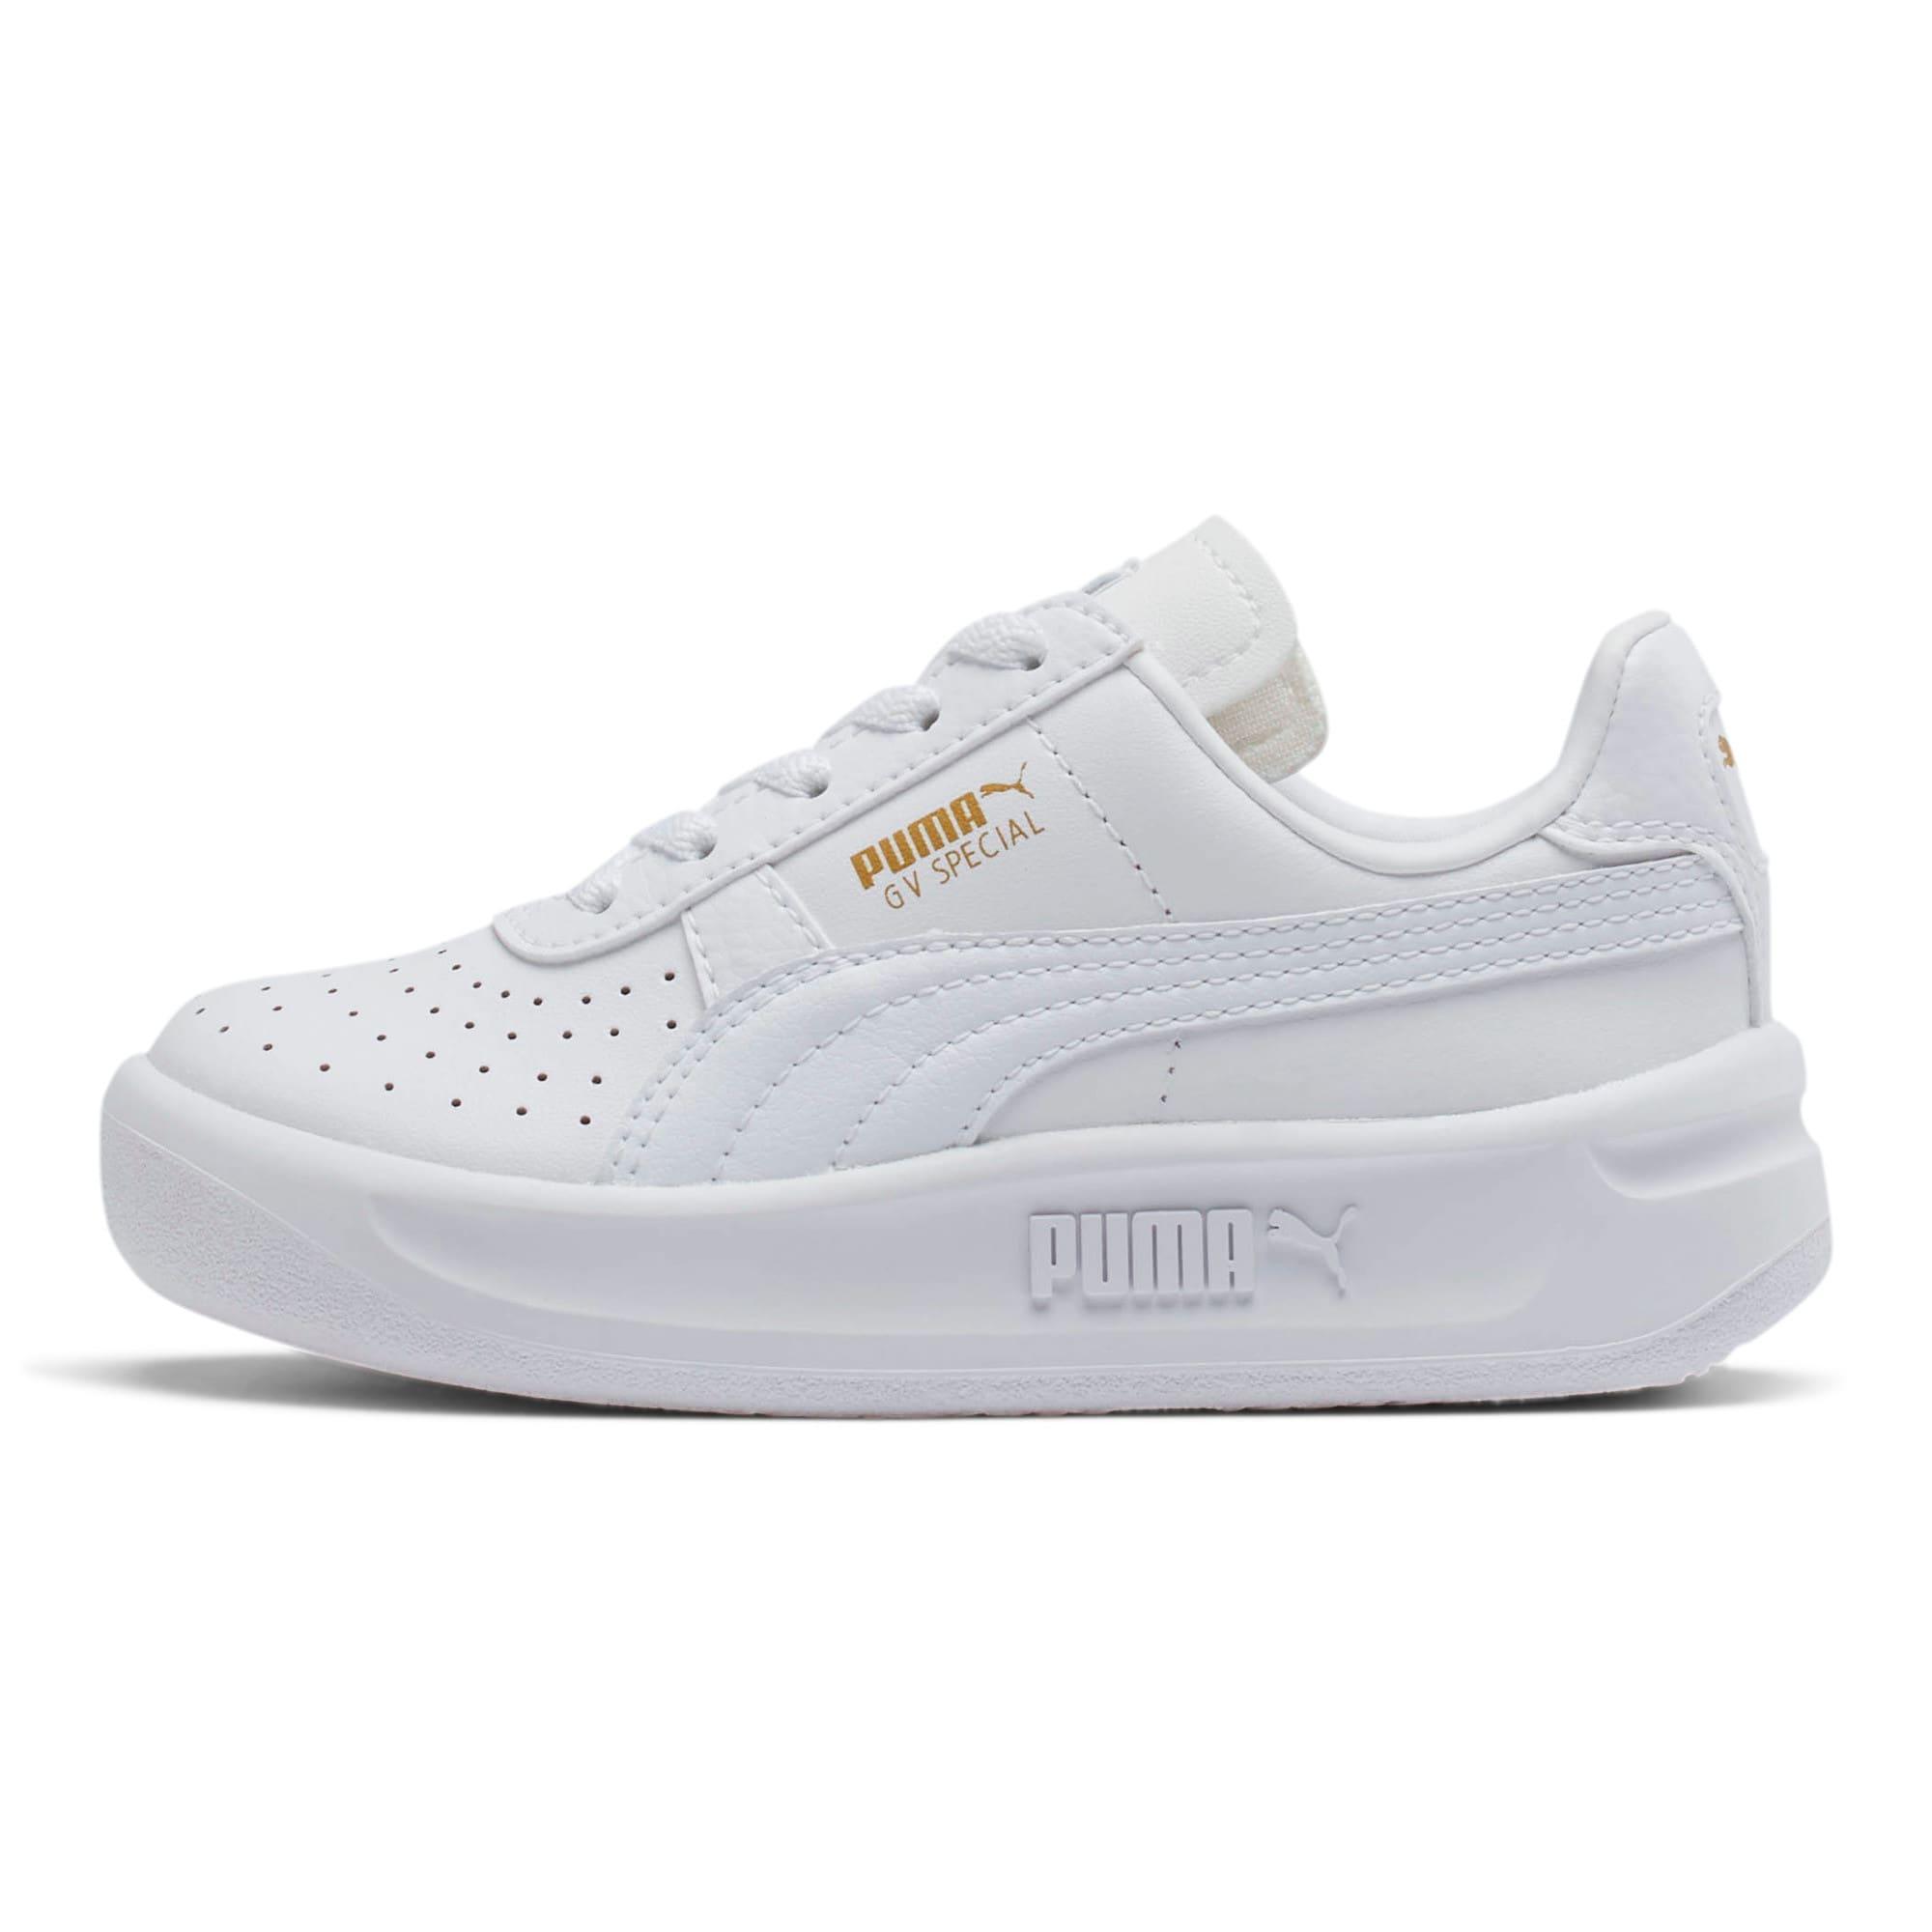 Thumbnail 1 of GV Special Little Kids' Shoes, Puma White-Puma Team Gold, medium